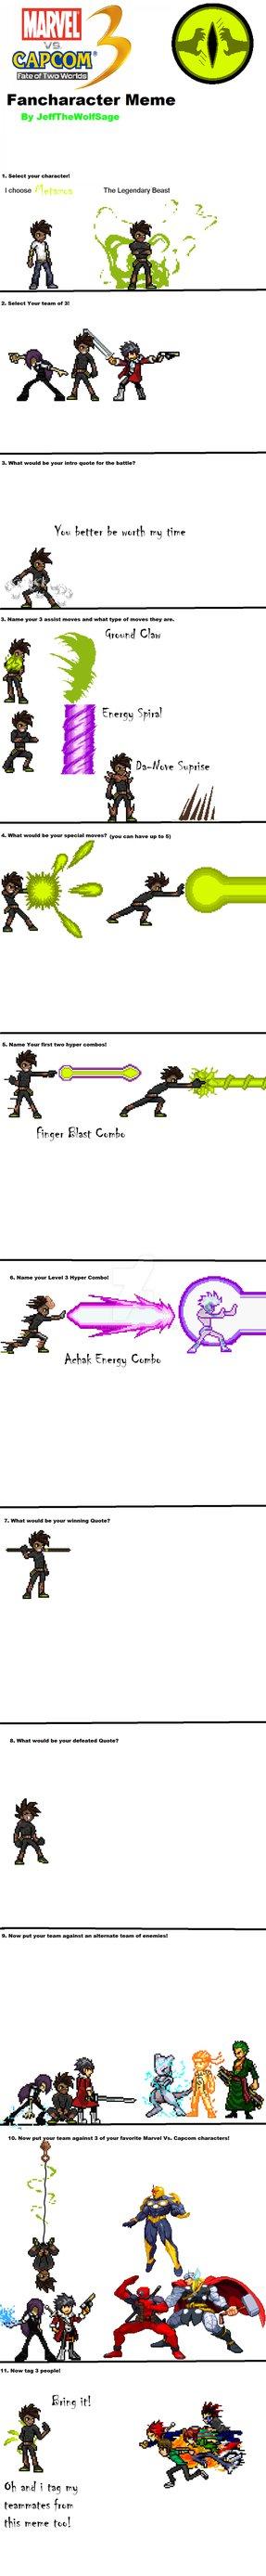 marvel vs capcom 3 meme featuring Metazoa by Clethrow on DeviantArt.